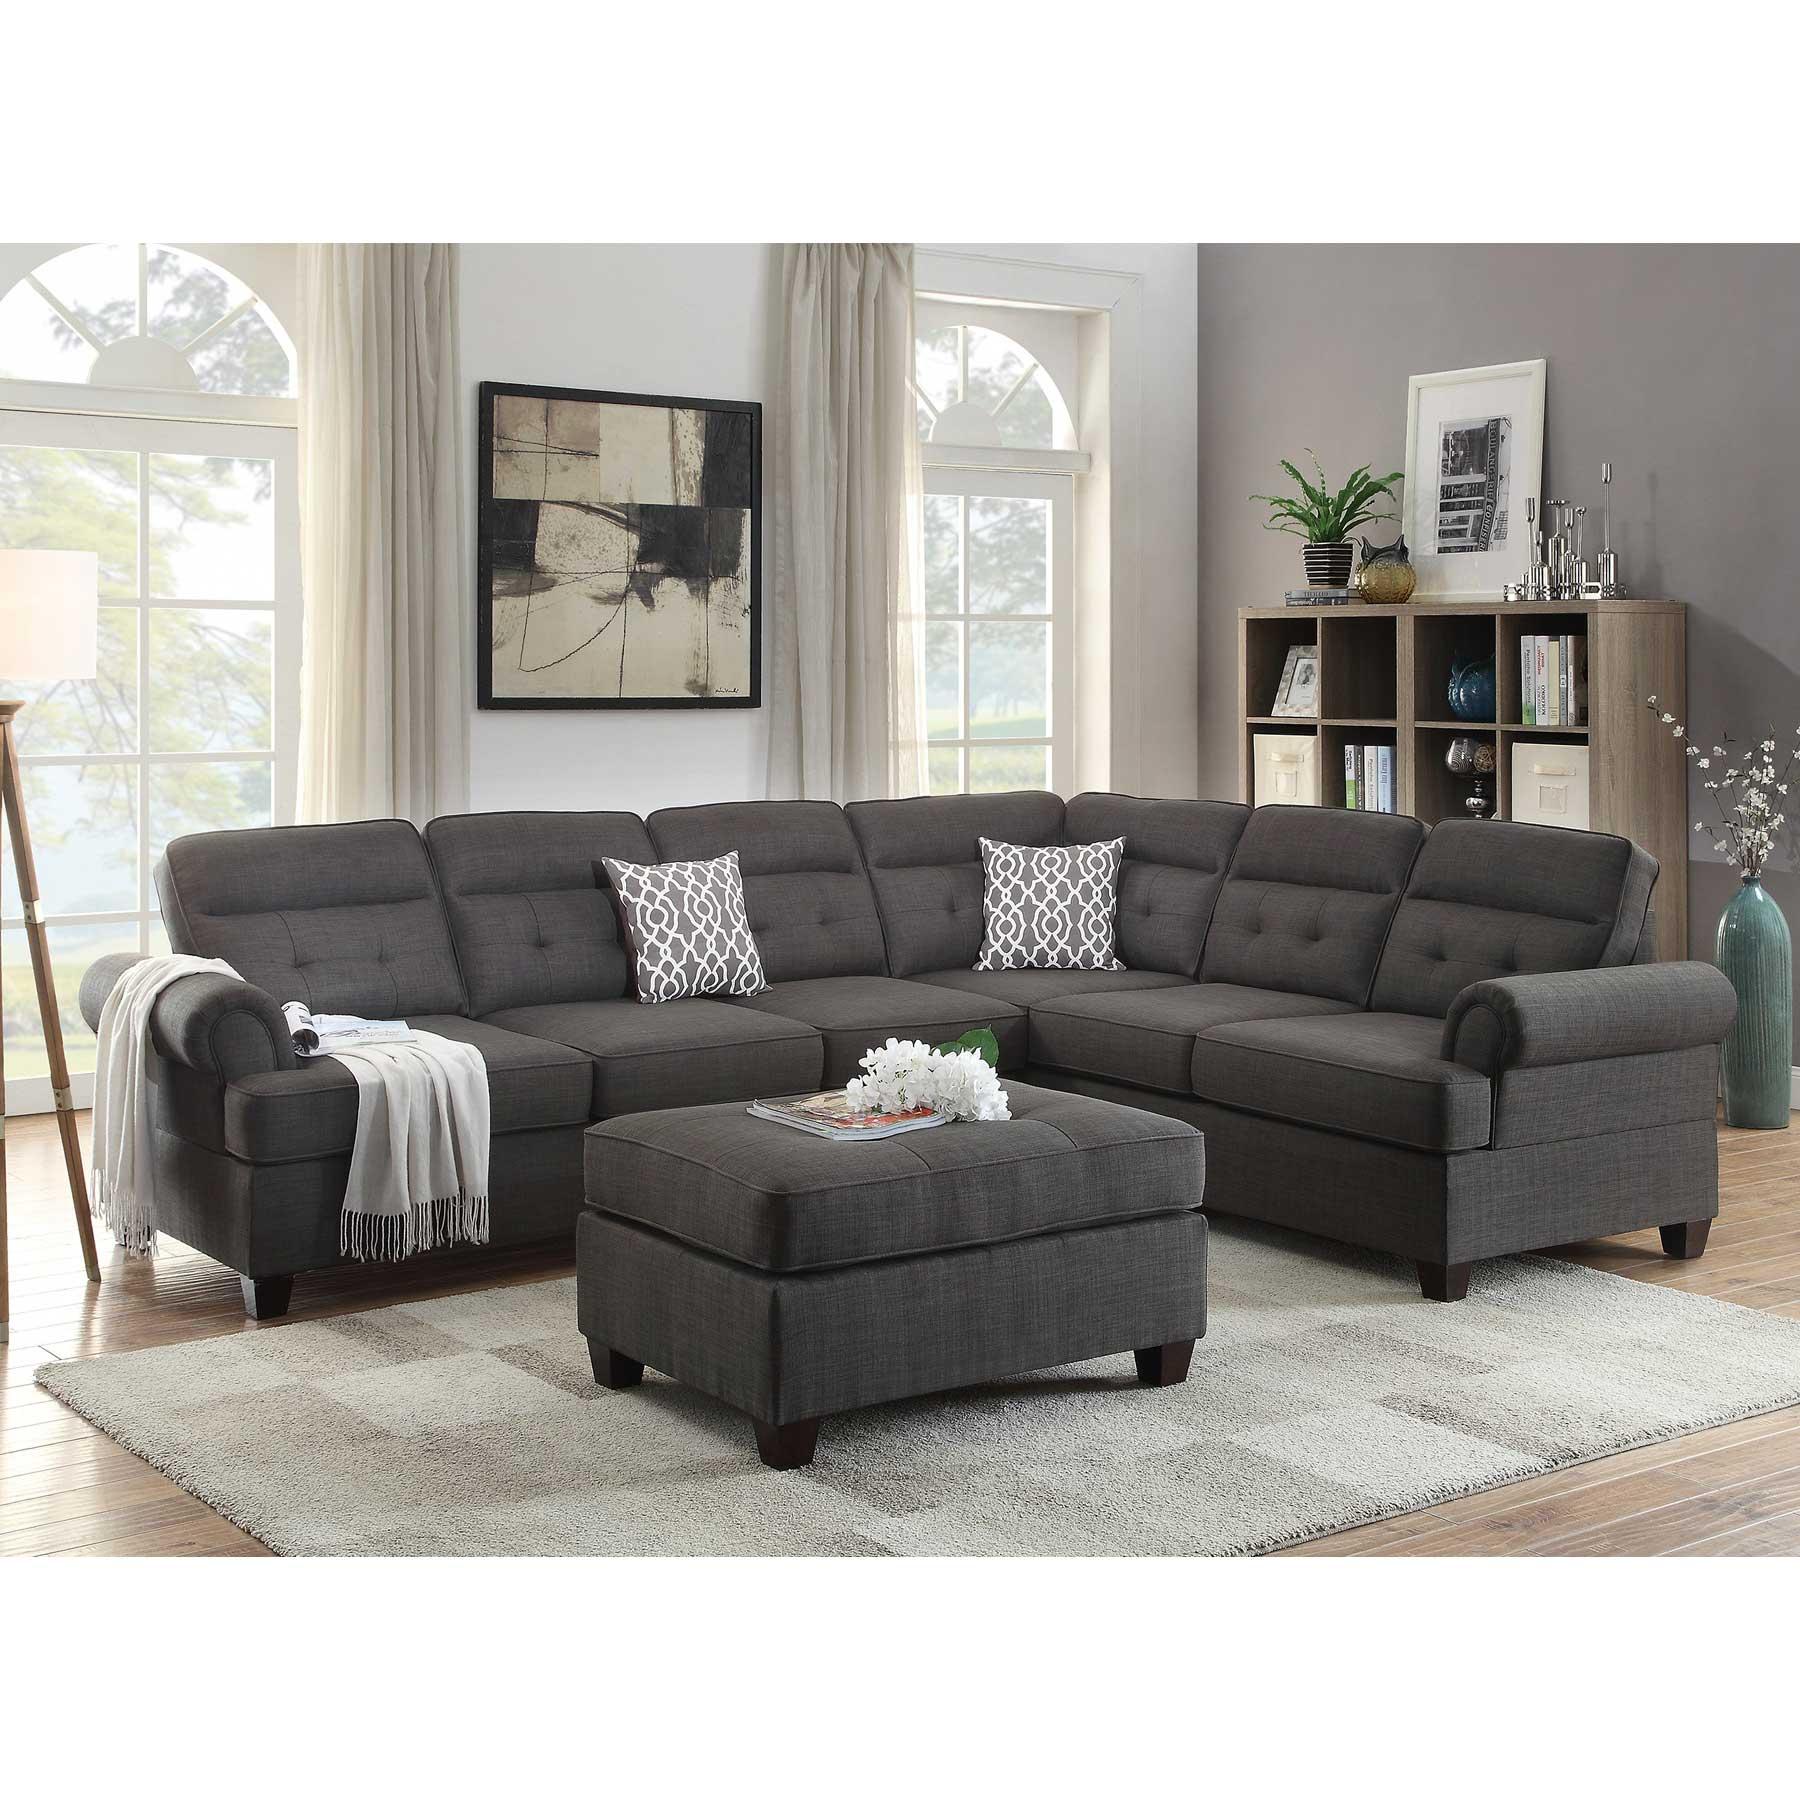 Ash black Dorris Fabric Sectional Sofa